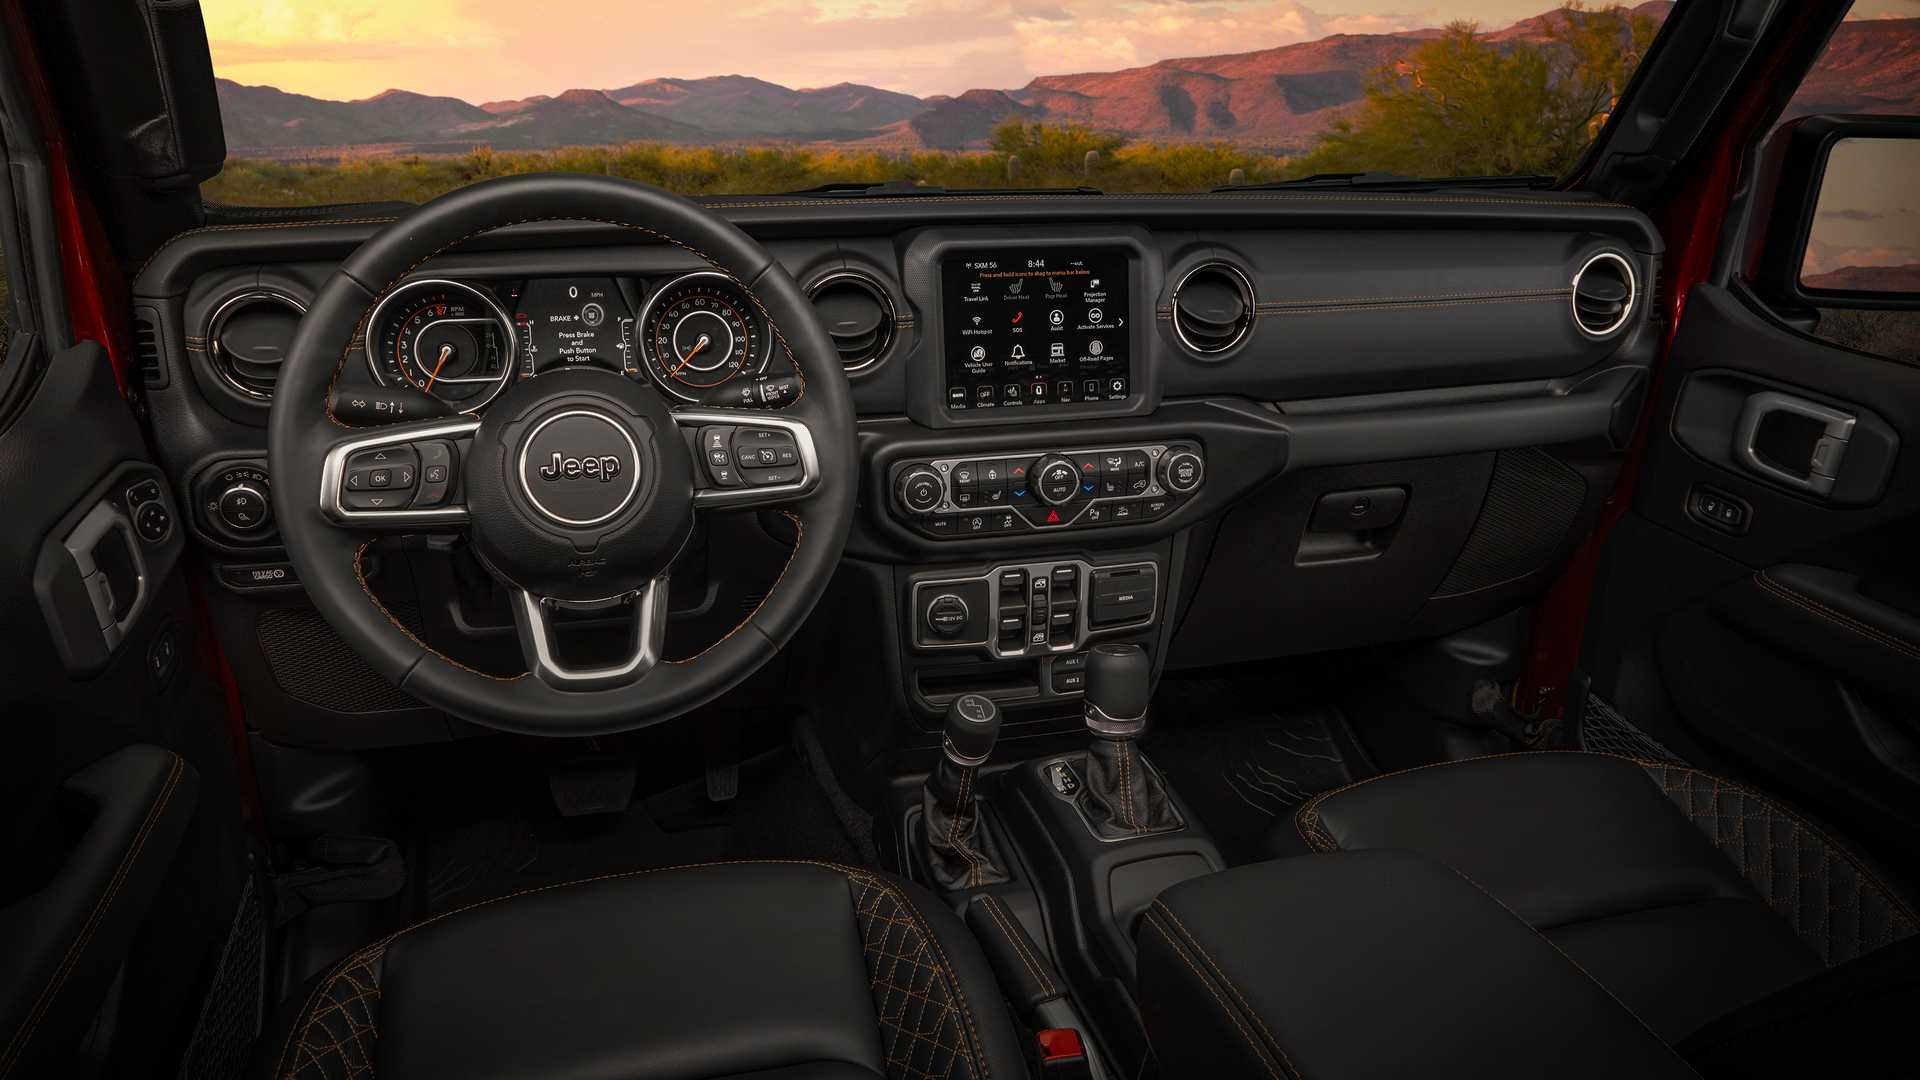 2020-jeep-gladiator-high-altitude-3